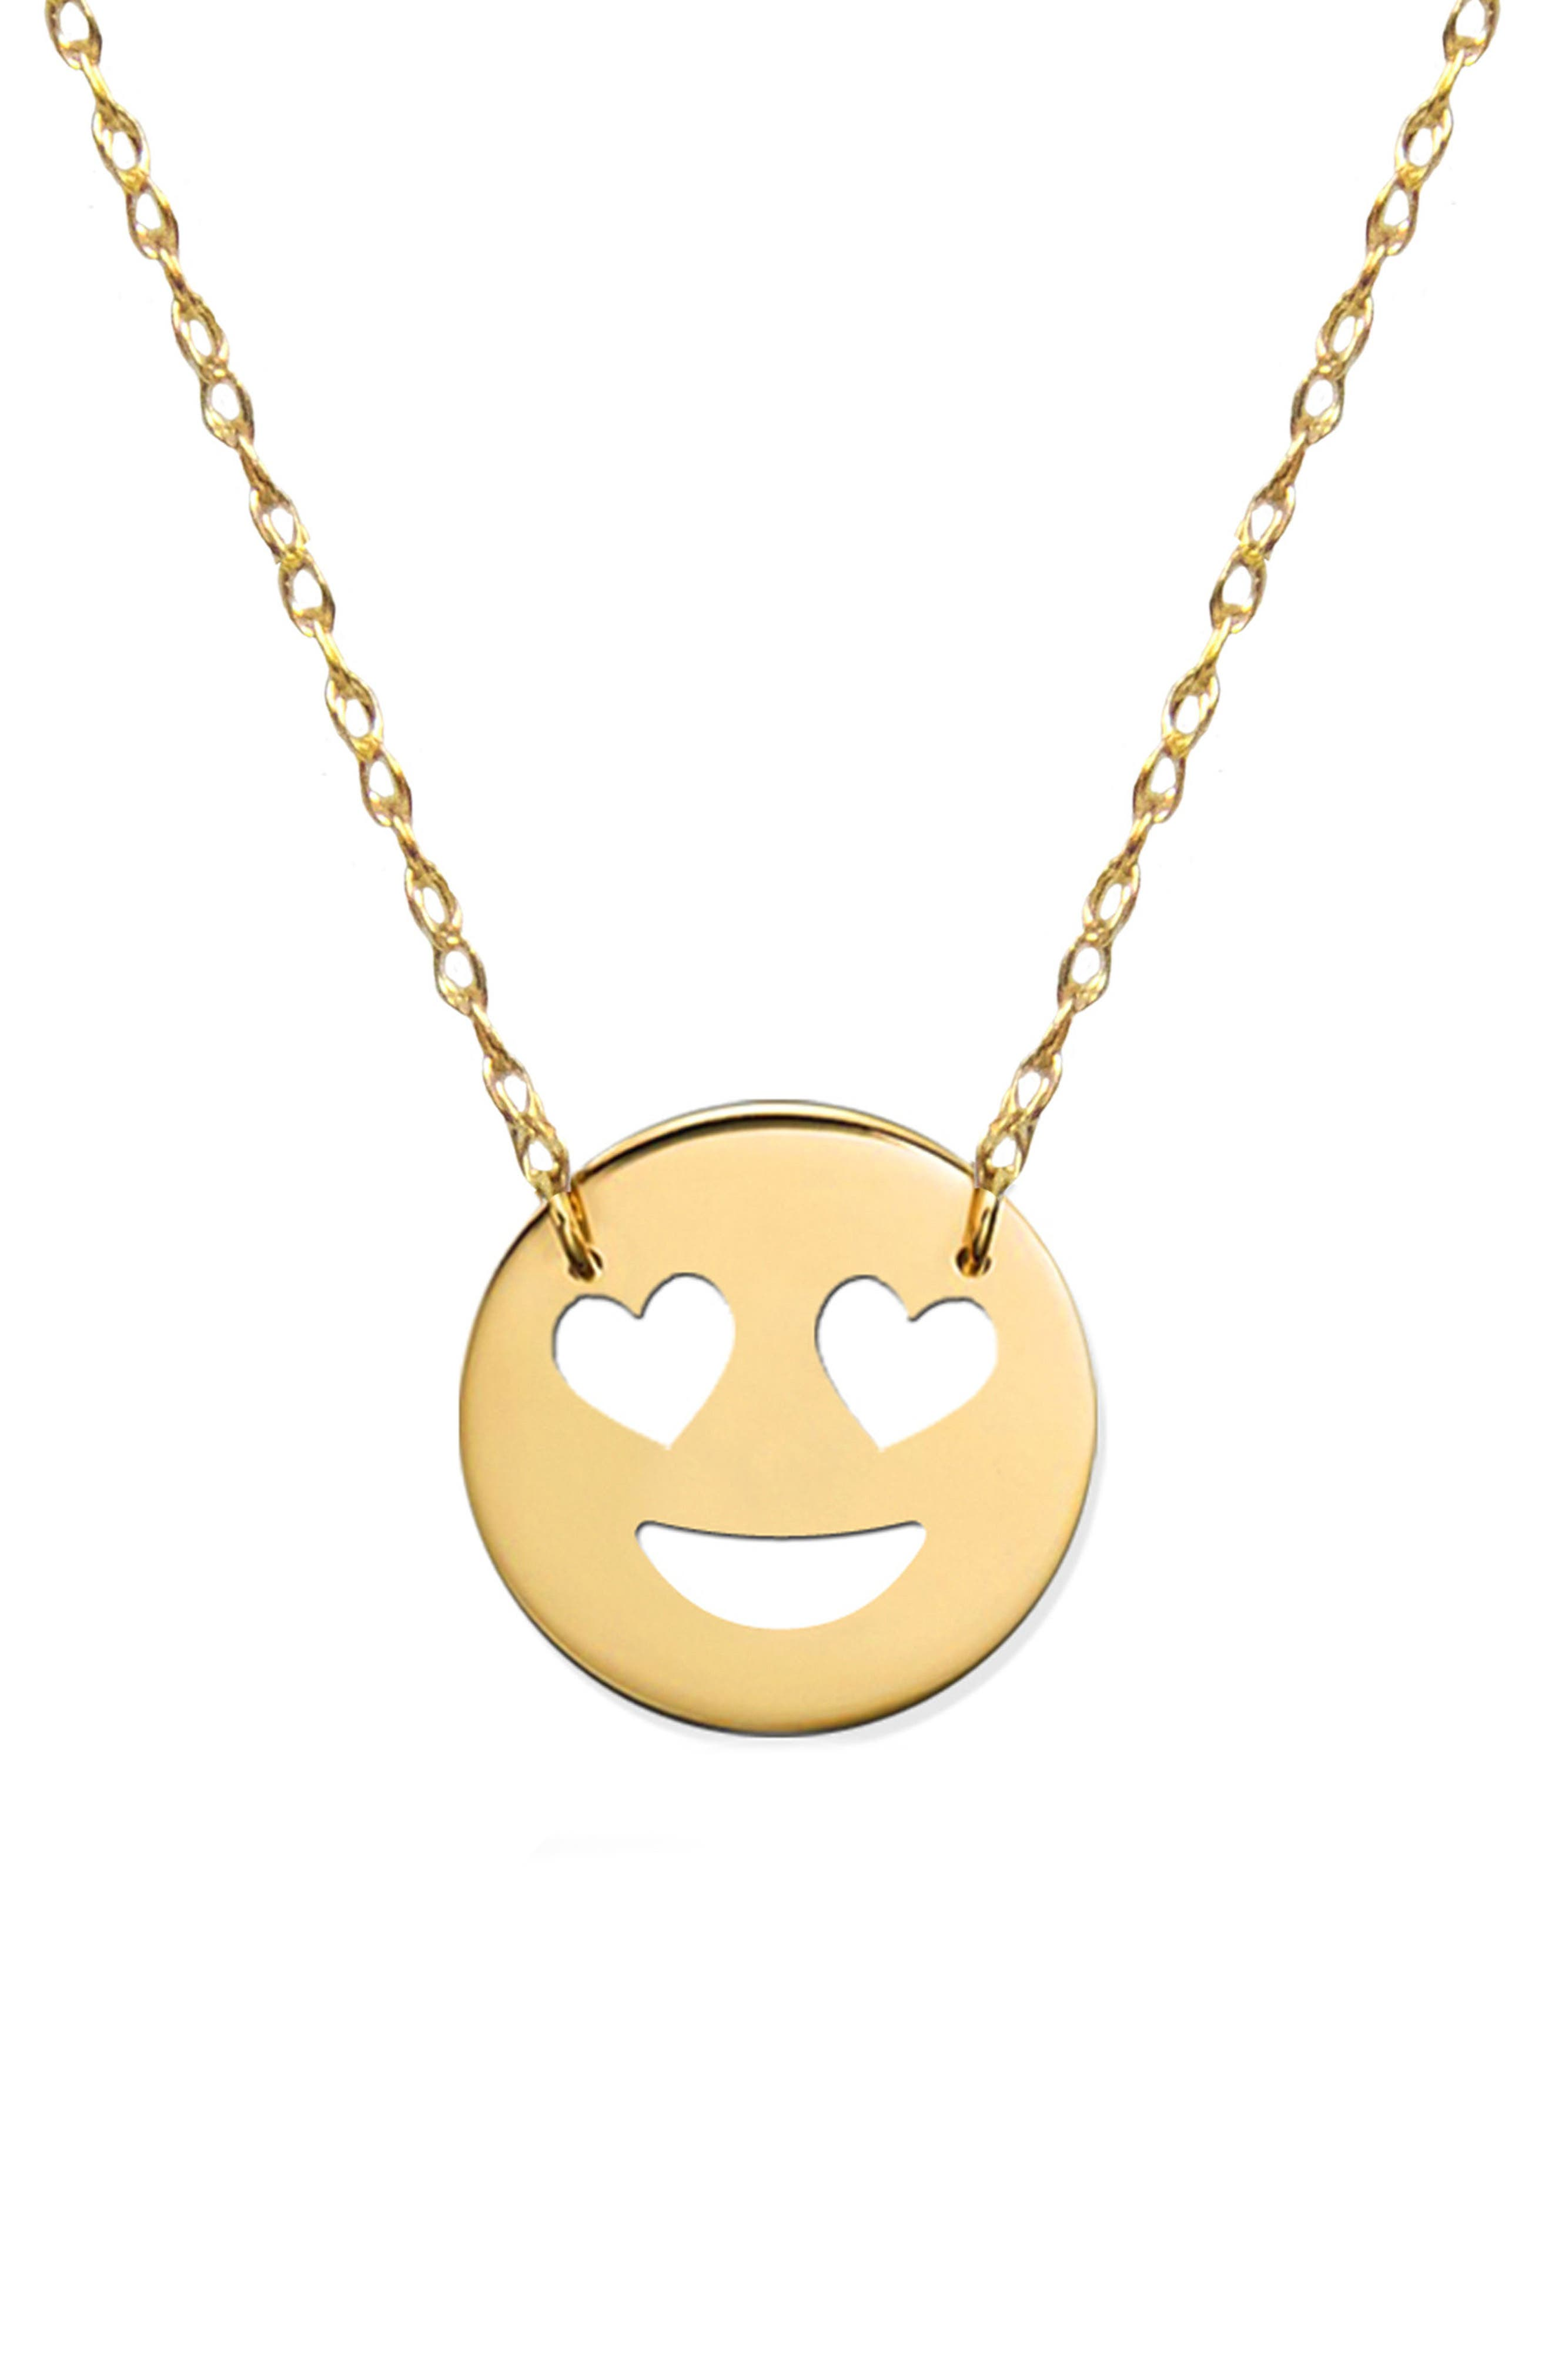 Alternate Image 1 Selected - Jane Basch Designs Love Emoji Pendant Necklace (Nordstrom Exclusive)